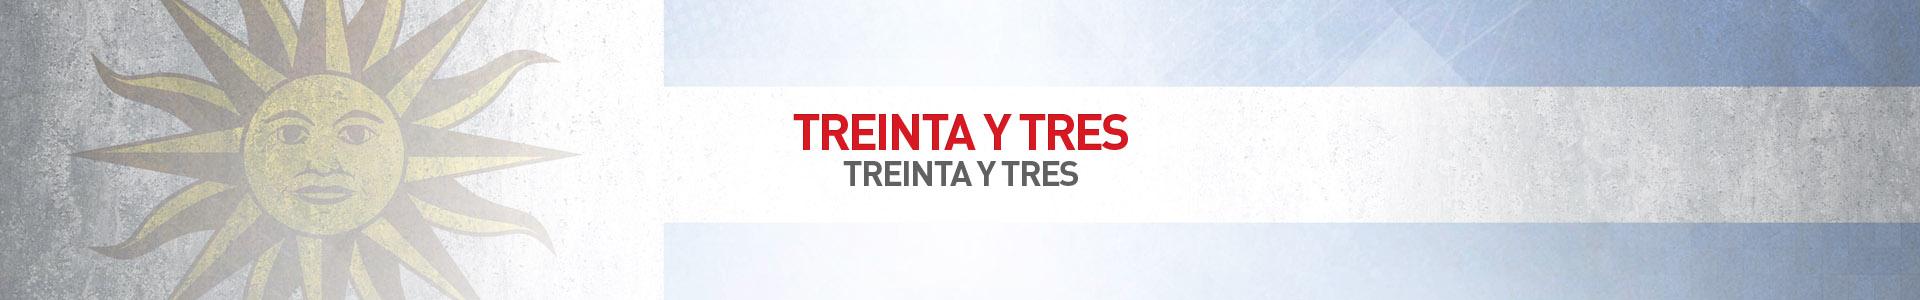 Topo-Cidades-Treinta-y-Tres-SBA